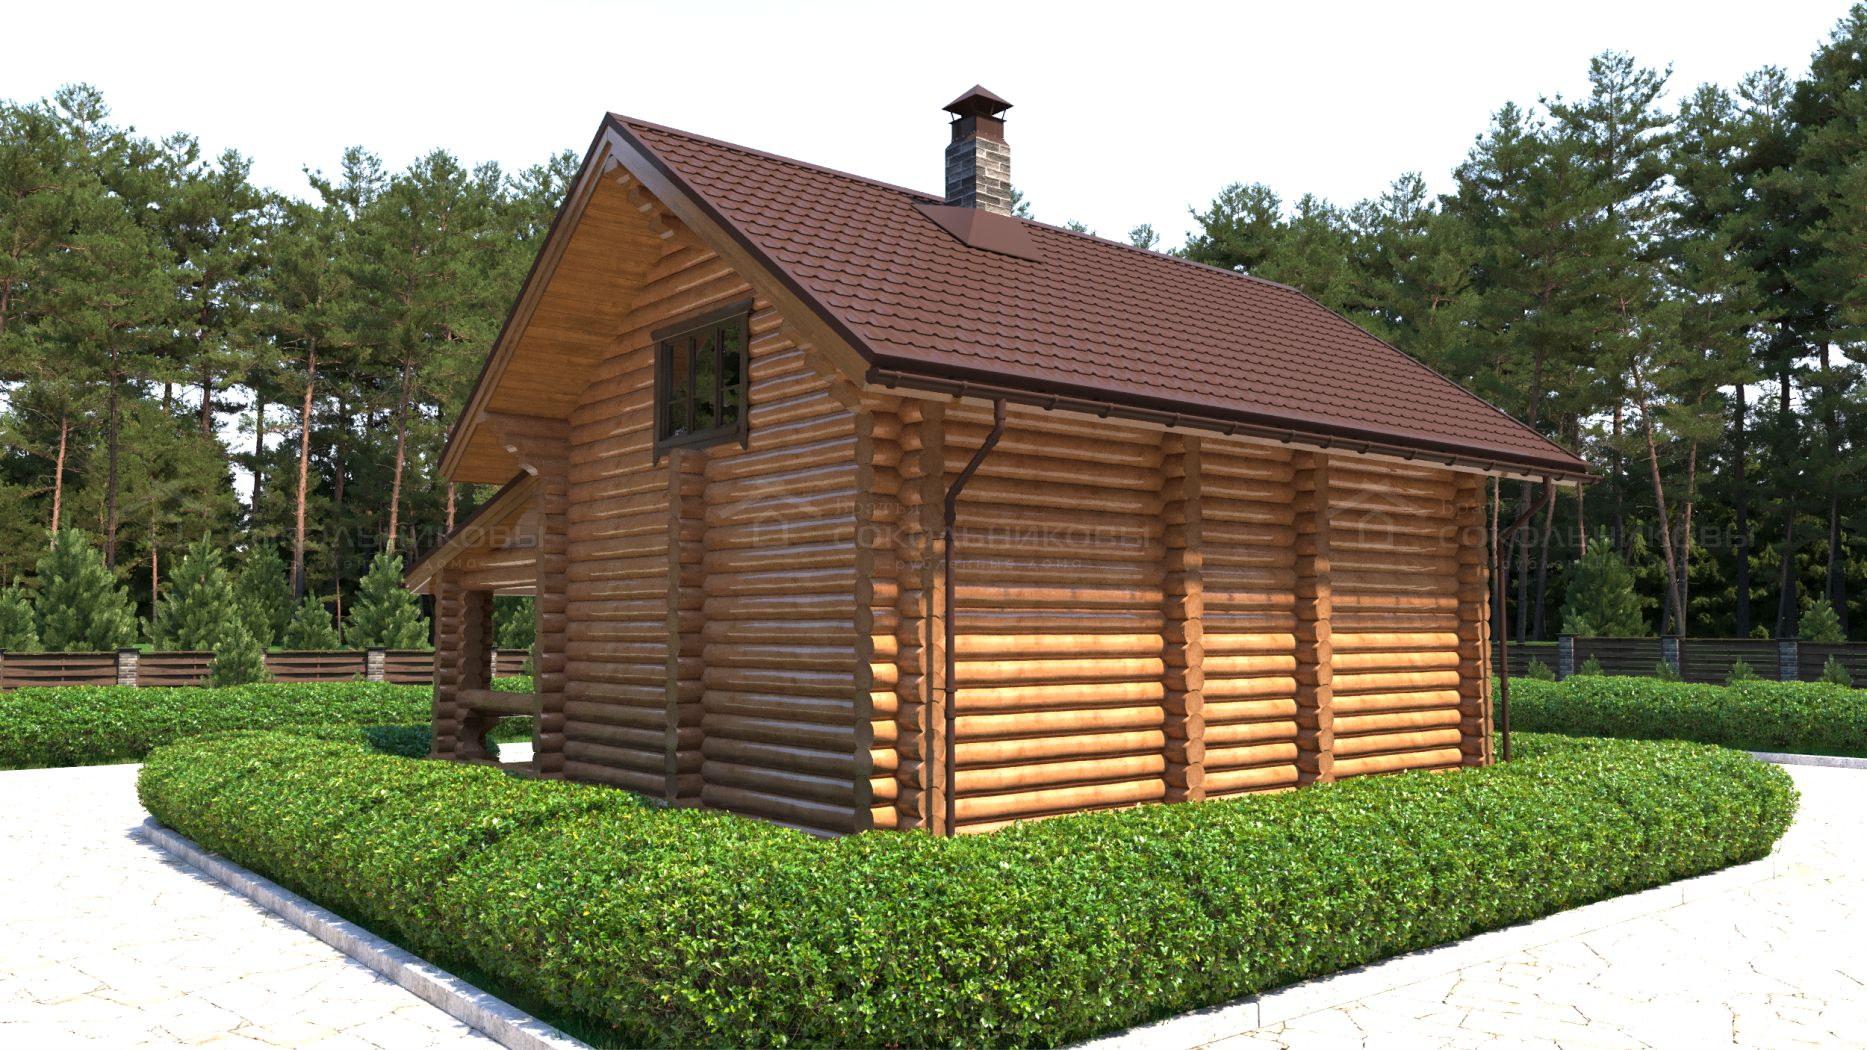 Дом-баня под рубанок, 123 кв. м, фото 6